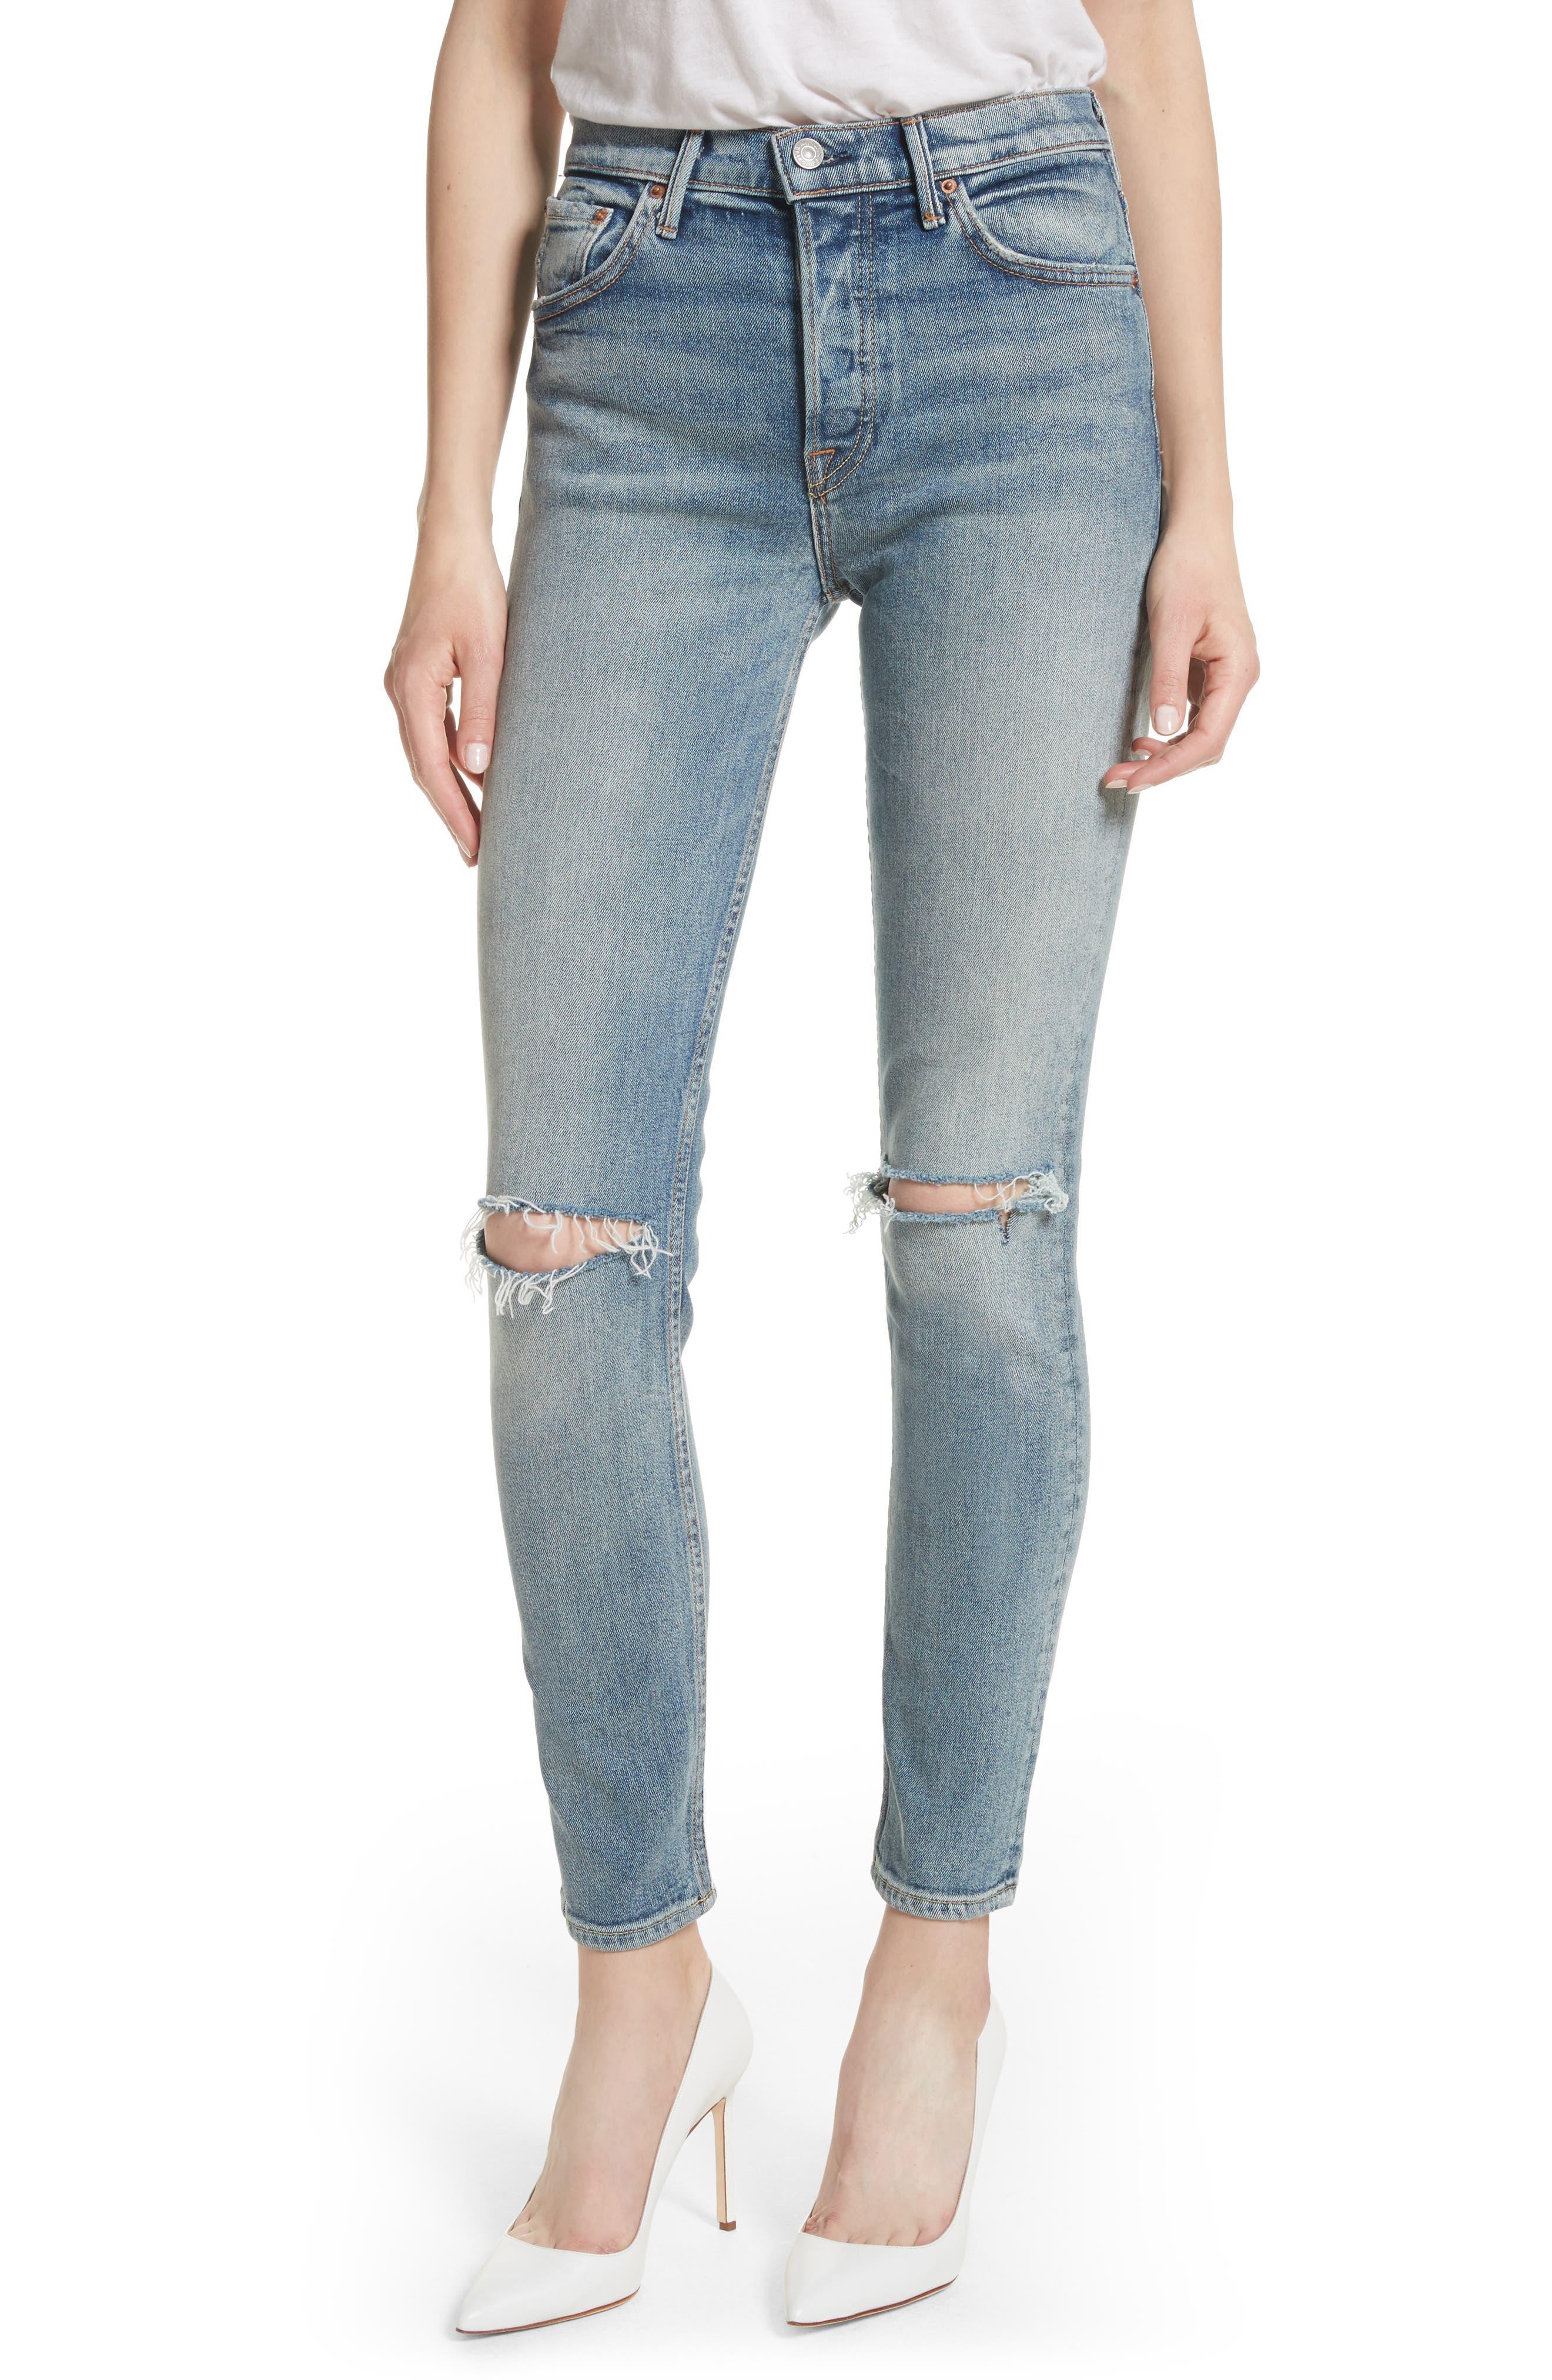 Karolina High Waist Jeans,                             Main thumbnail 1, color,                             WHAT IS LIFE